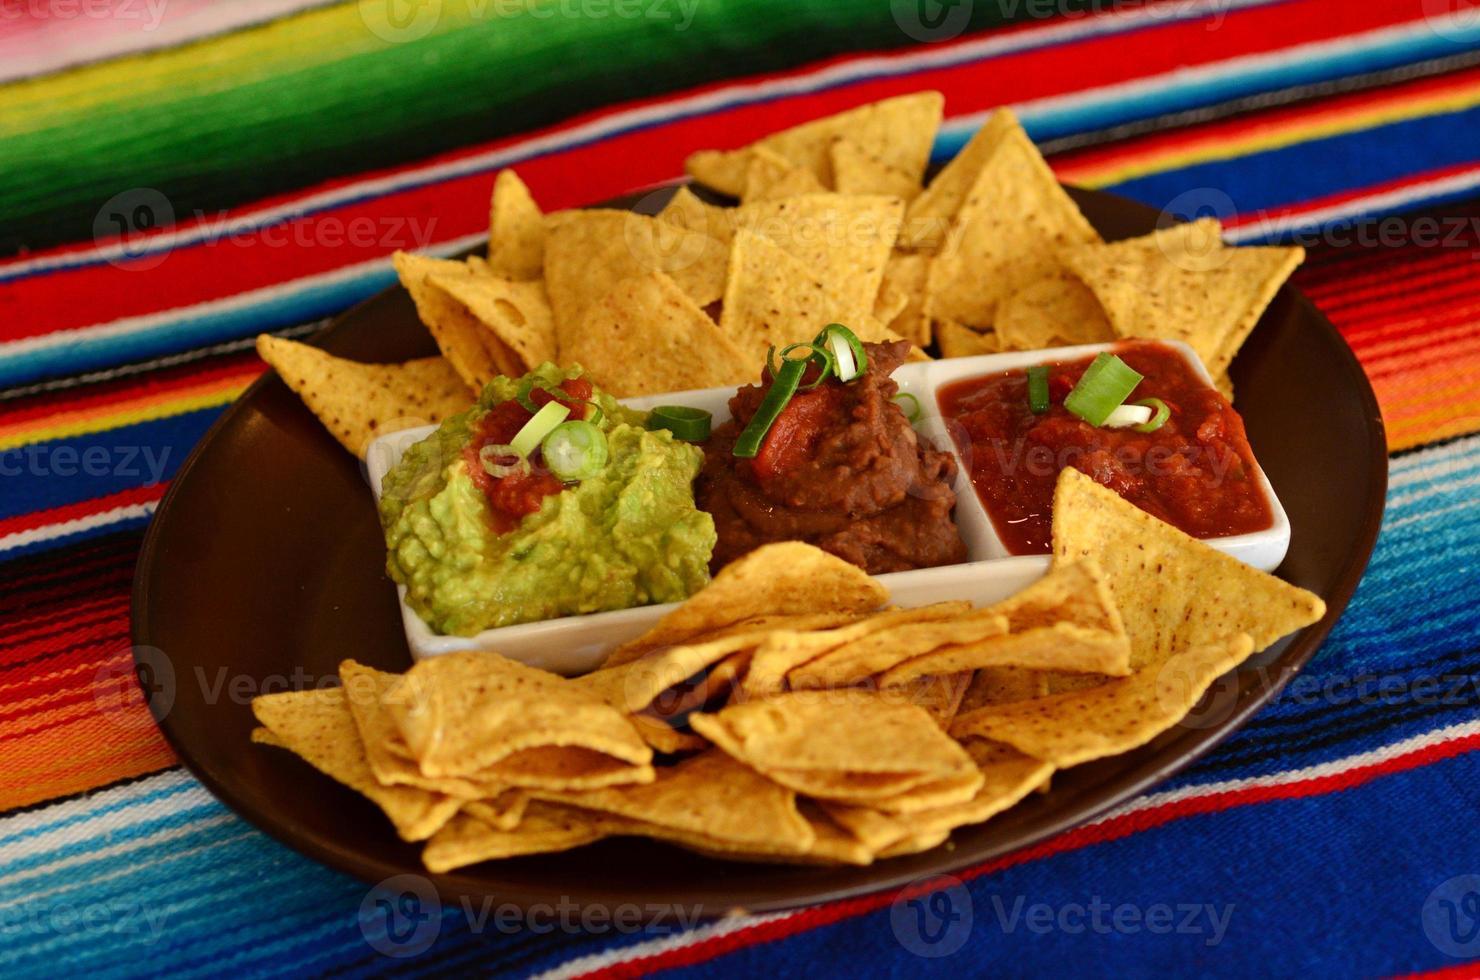 comida mexicana - nachos foto